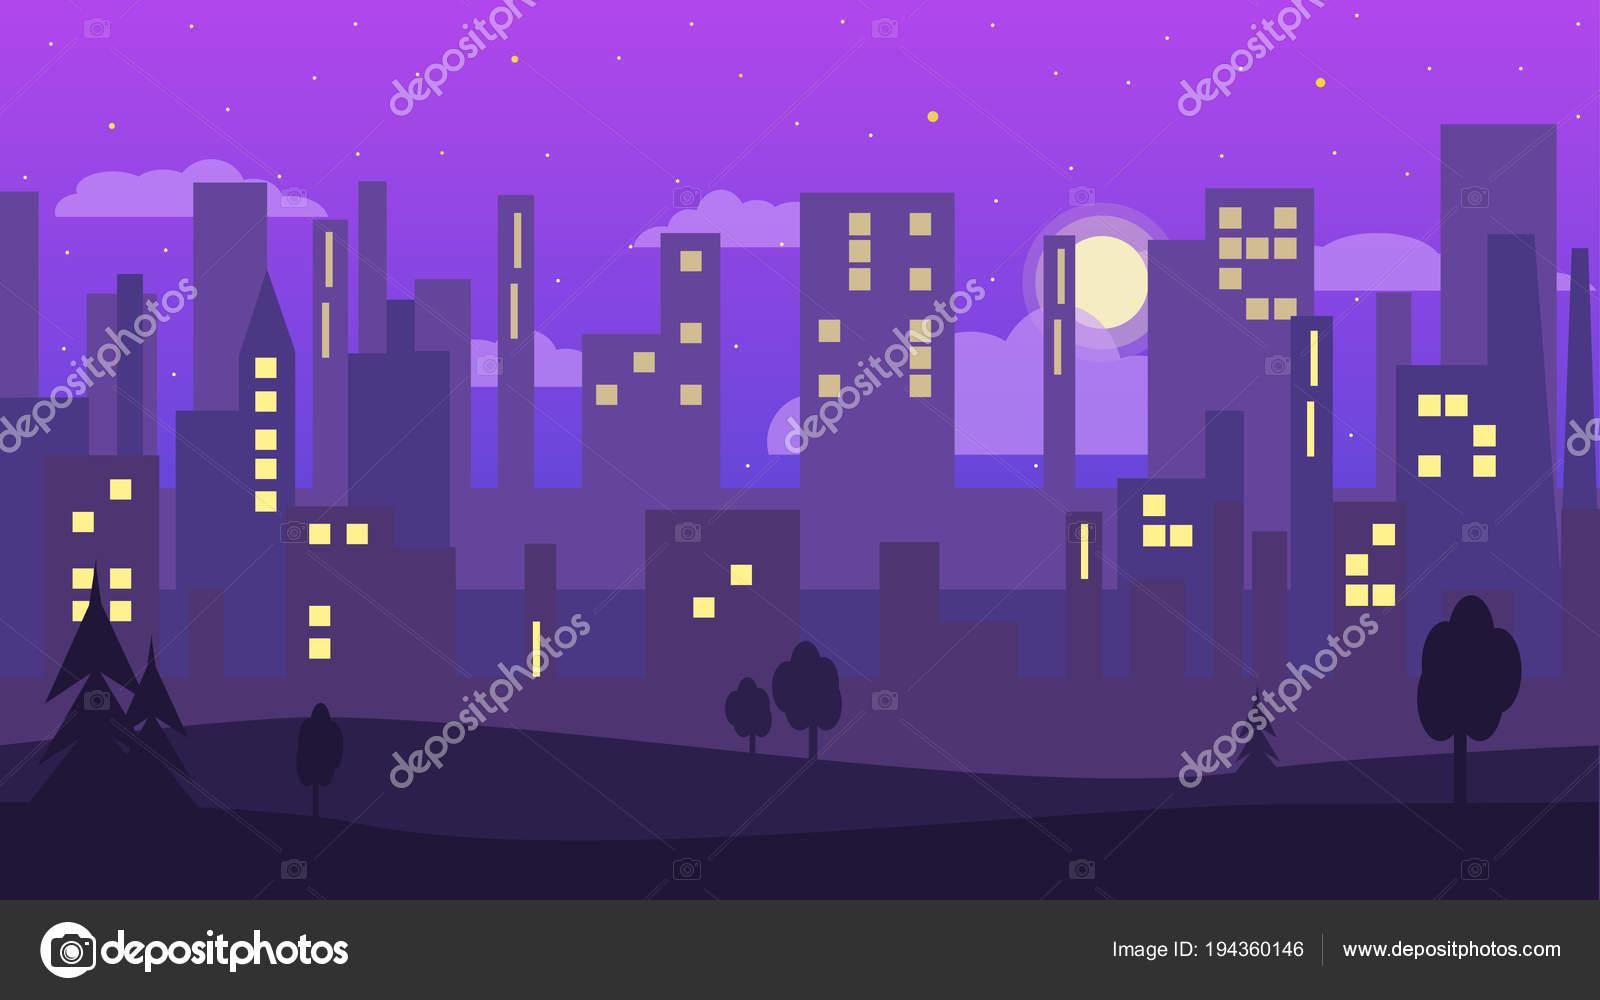 Nächtliche Stadt Flachen Stil Tapete Lila Farben Stadtsilhouette Vektor  Illustration U2014 Stockvektor